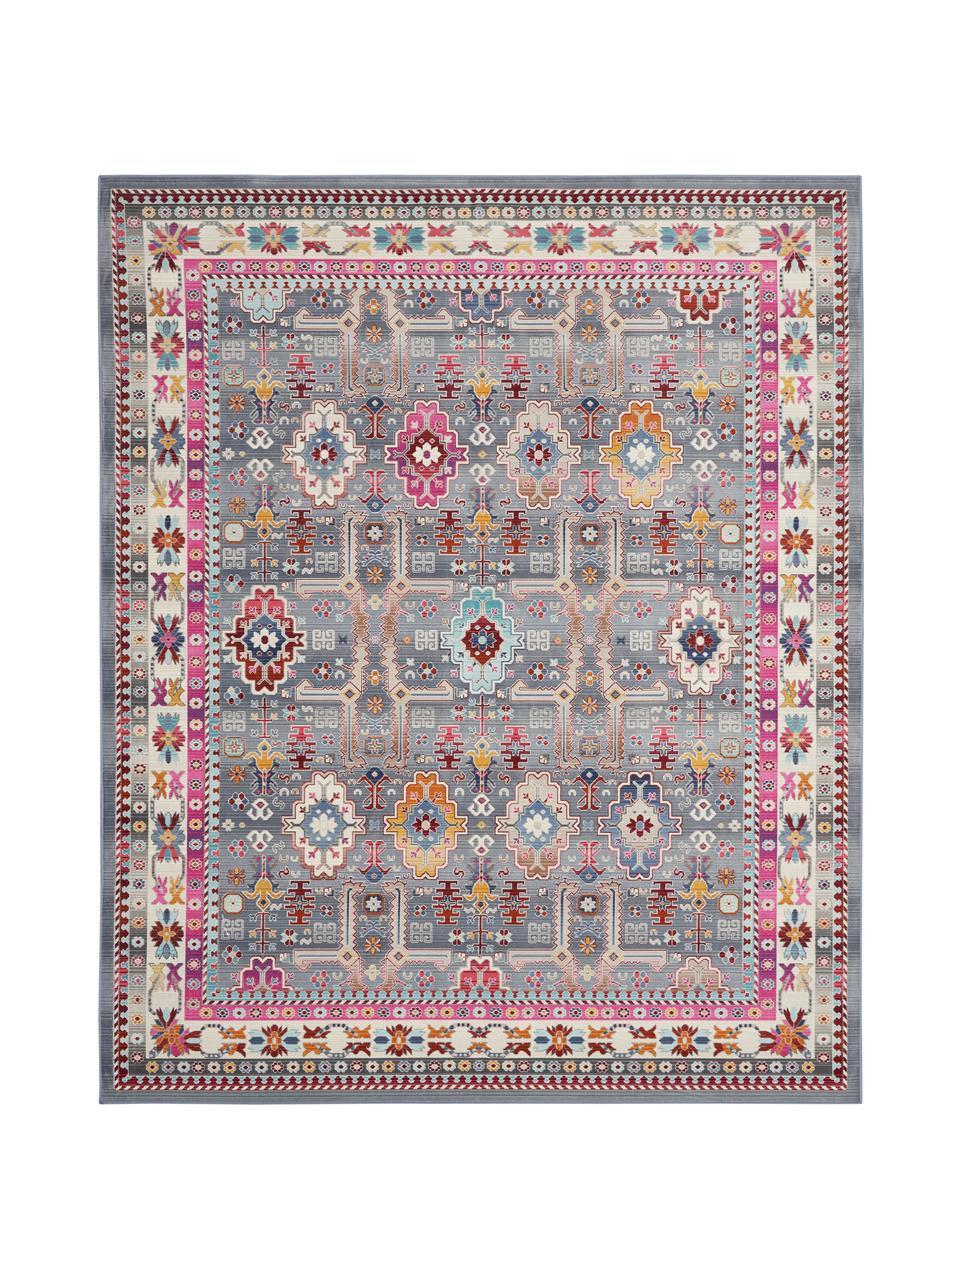 Teppich Vintage Kashan mit buntem Vintagemuster, Flor: 100% Polypropylen, Grau, Mehrfarbig, B 270 x L 360 cm (Größe XL)